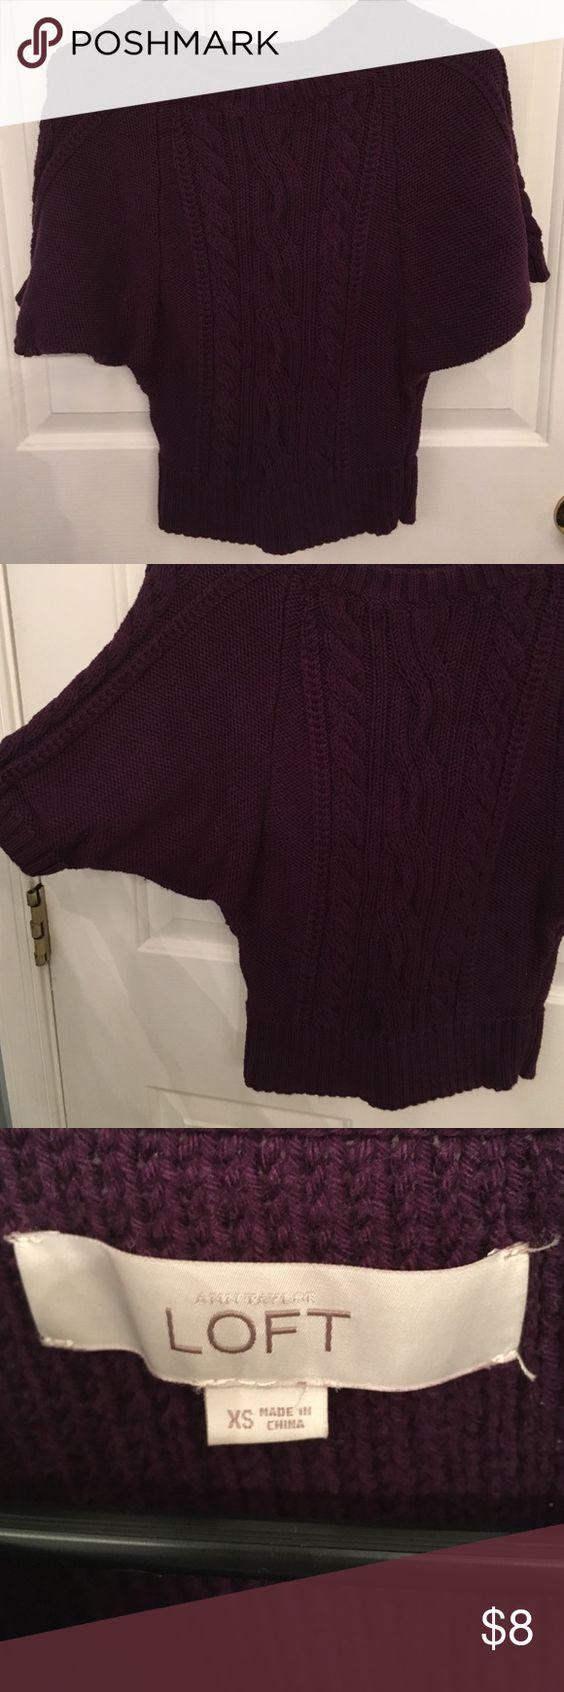 Ann Taylor Loft Sweater Purple short sleeve sweater, perfect condition LOFT Sweaters